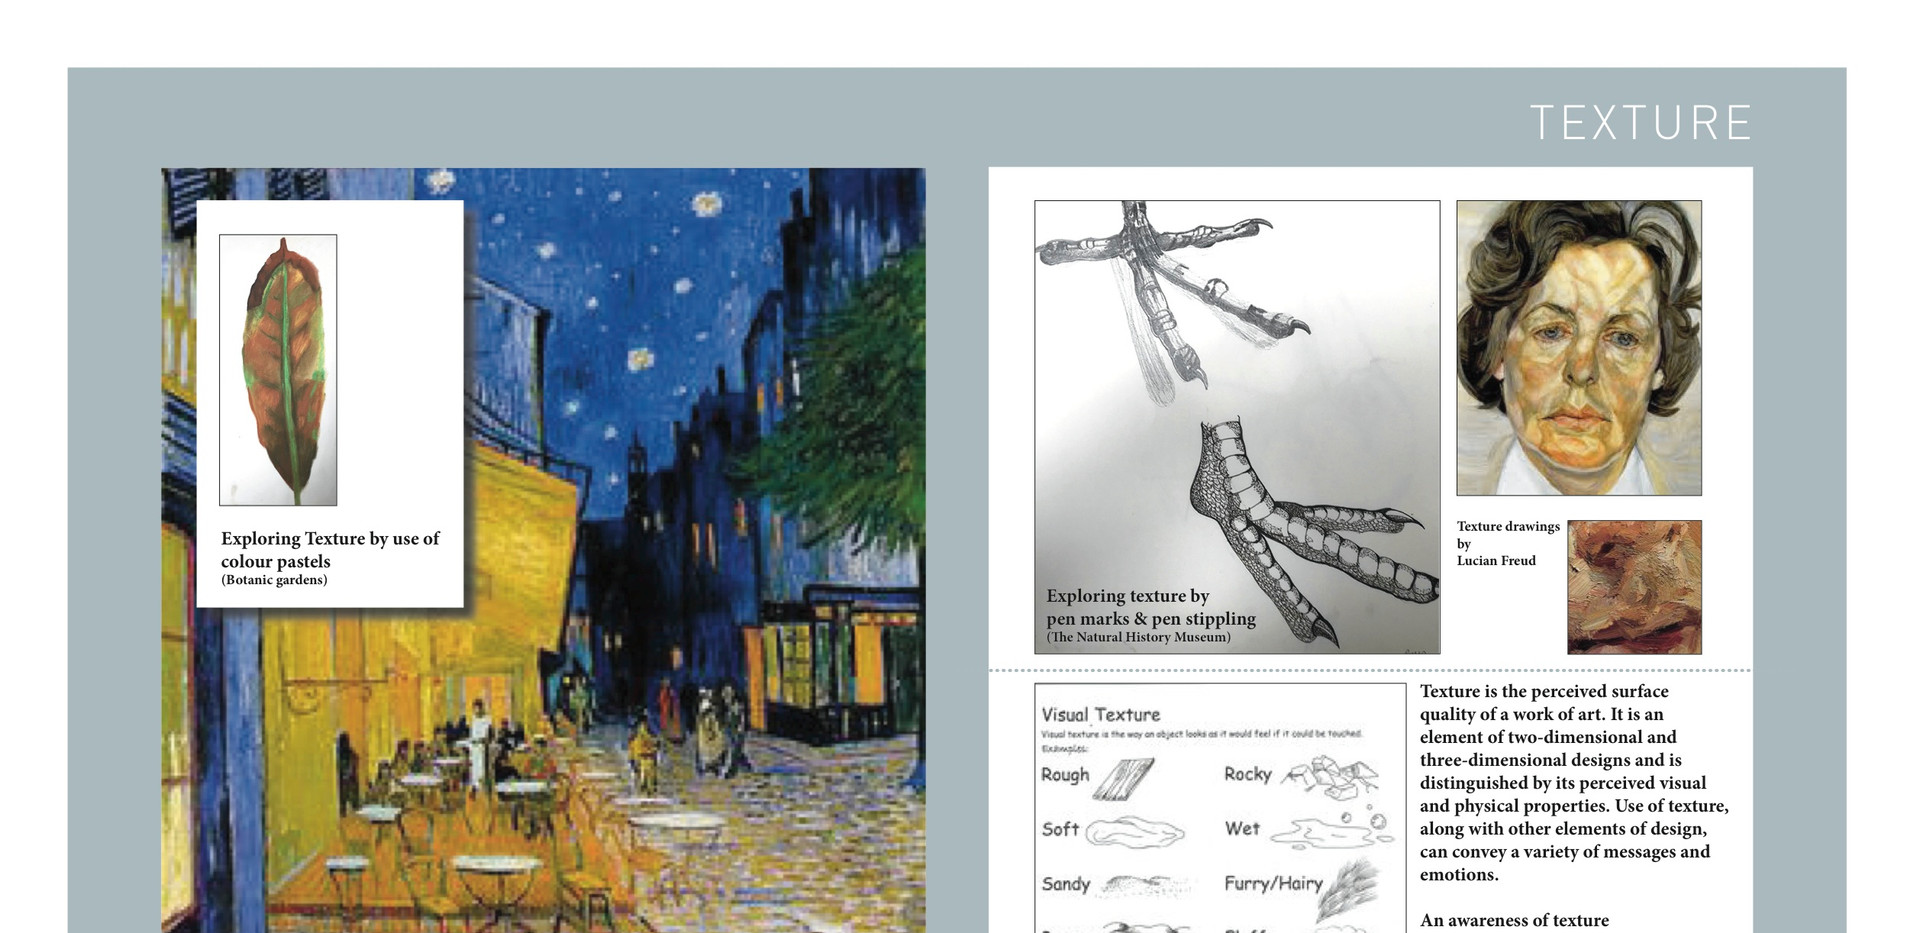 DIGITAL_NOTEBOOK_ART_ELEMENTS copy 6.jpg